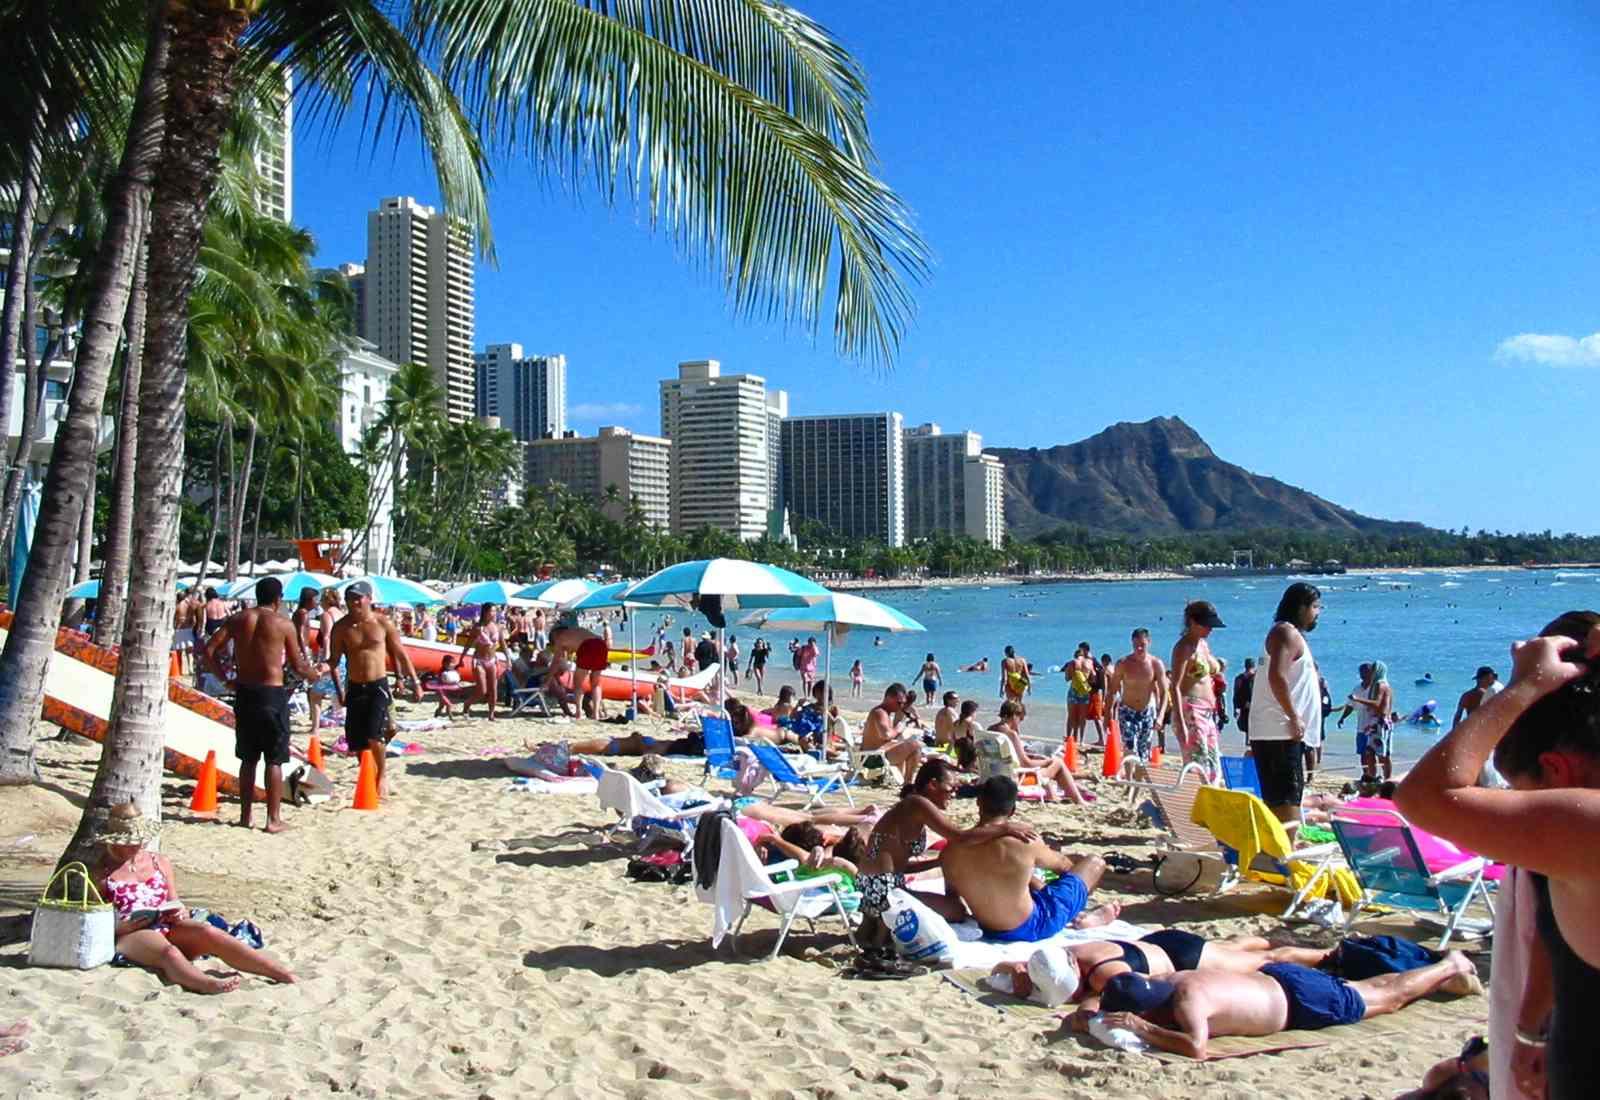 Hawaiian beach with people